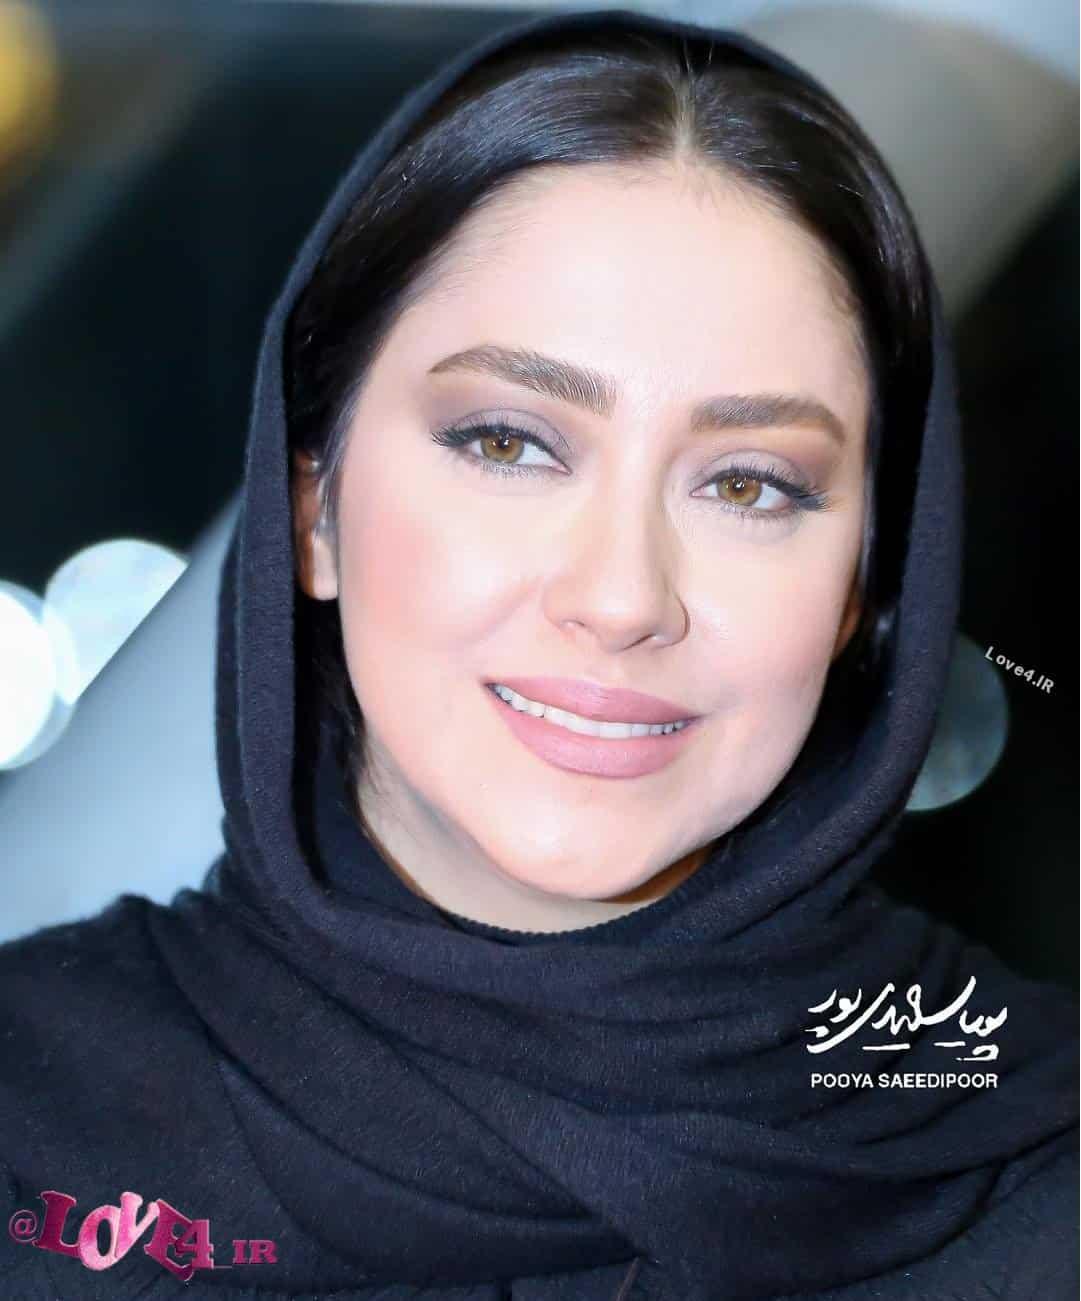 http://www.love4.ir/wp-content/uploads/2017/02/Bahareh_KianAfshar_JalebZiba_www_Love4_IR-1.jpg